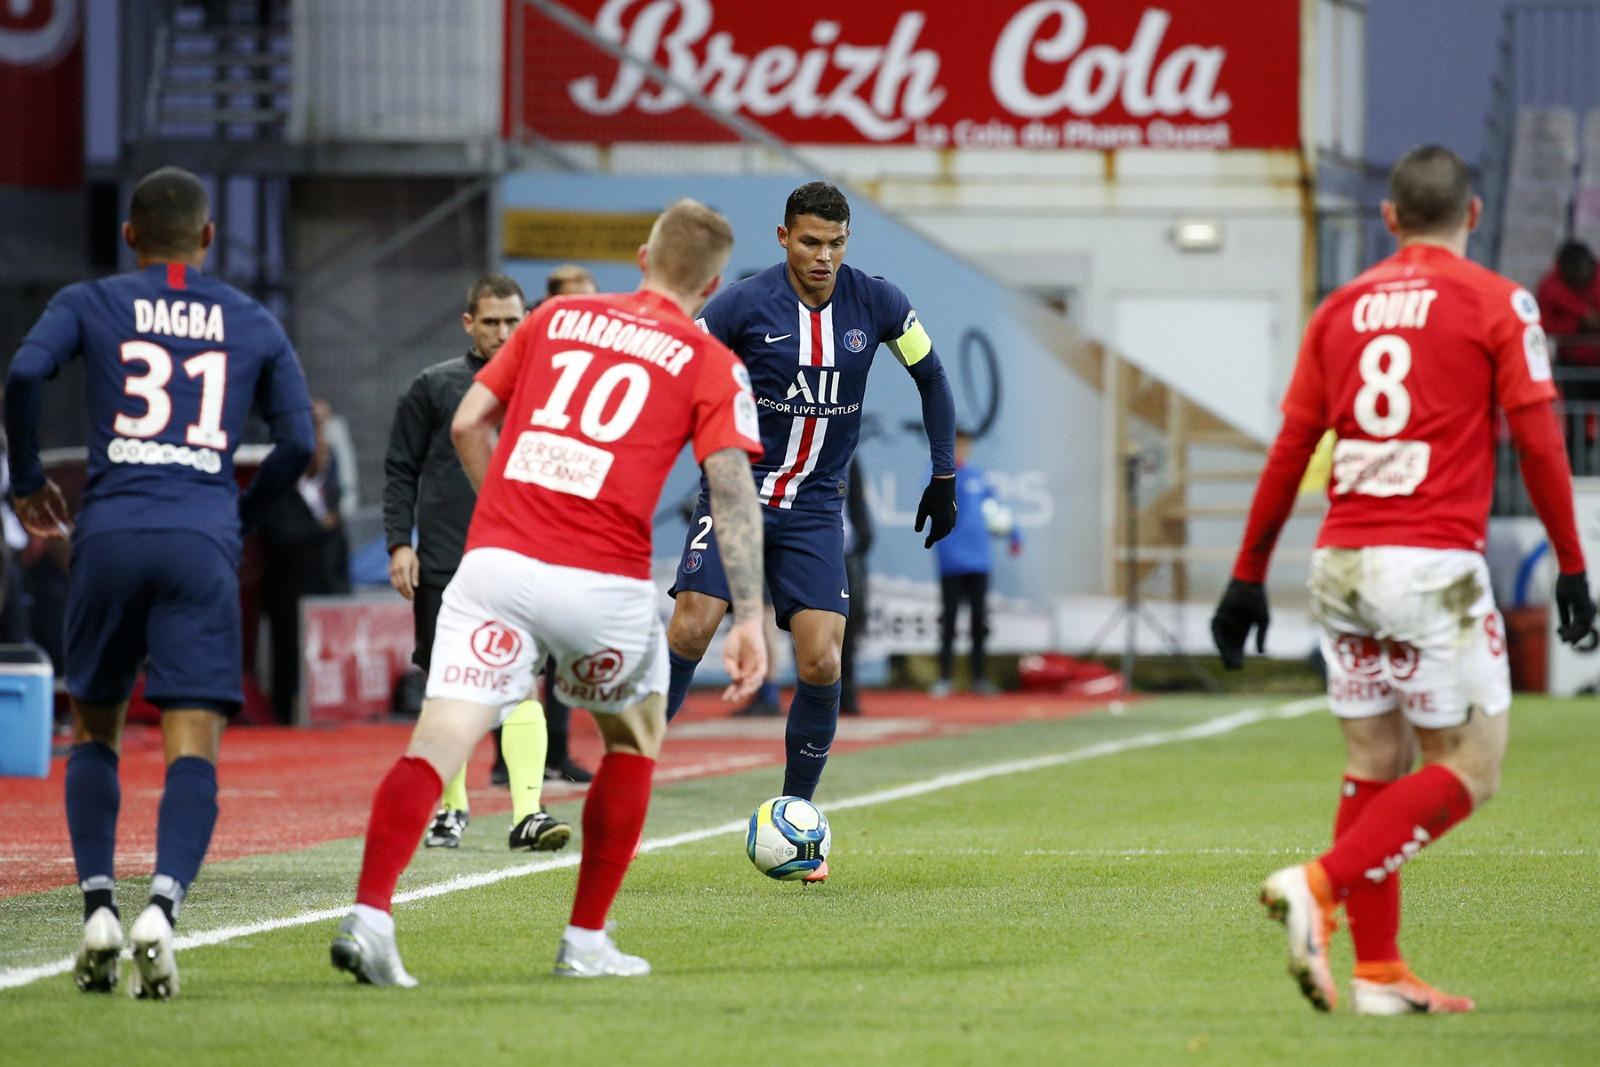 Brest V Paris Saint-Germain | Paris Saint-Germain